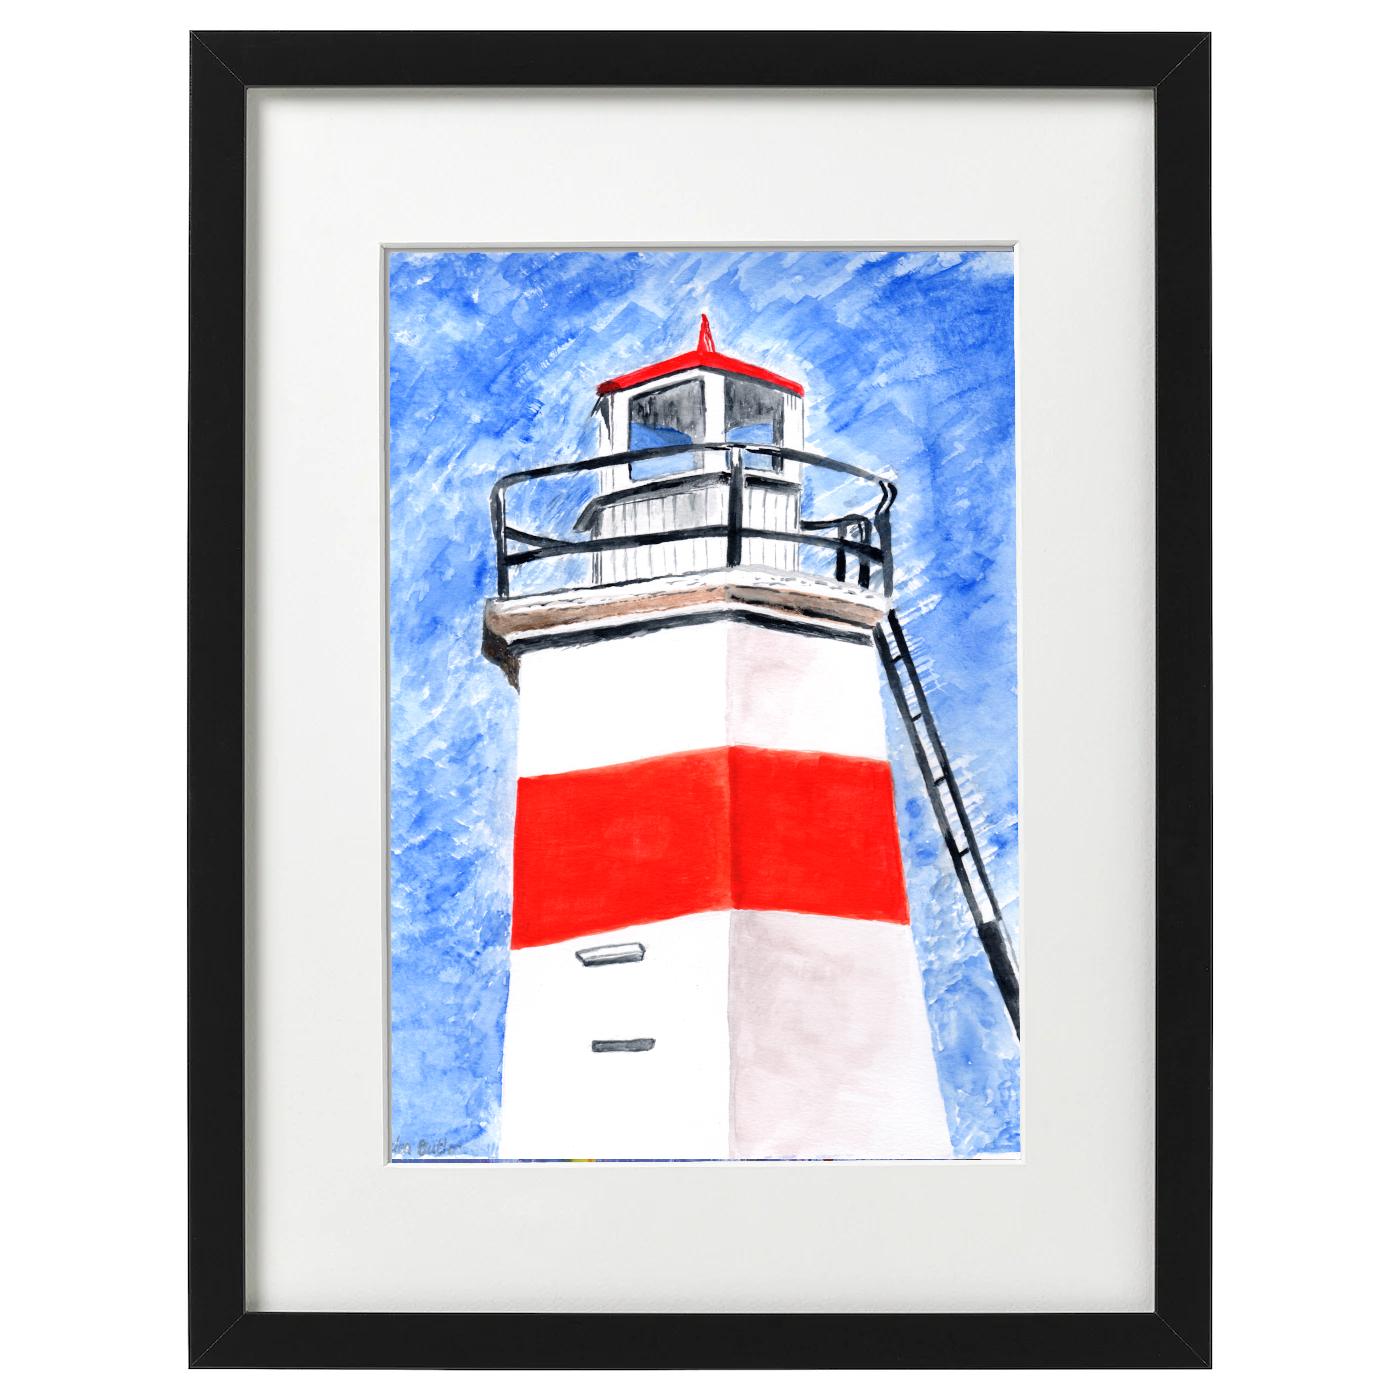 Crinan Canal Lighthouse - watercolour